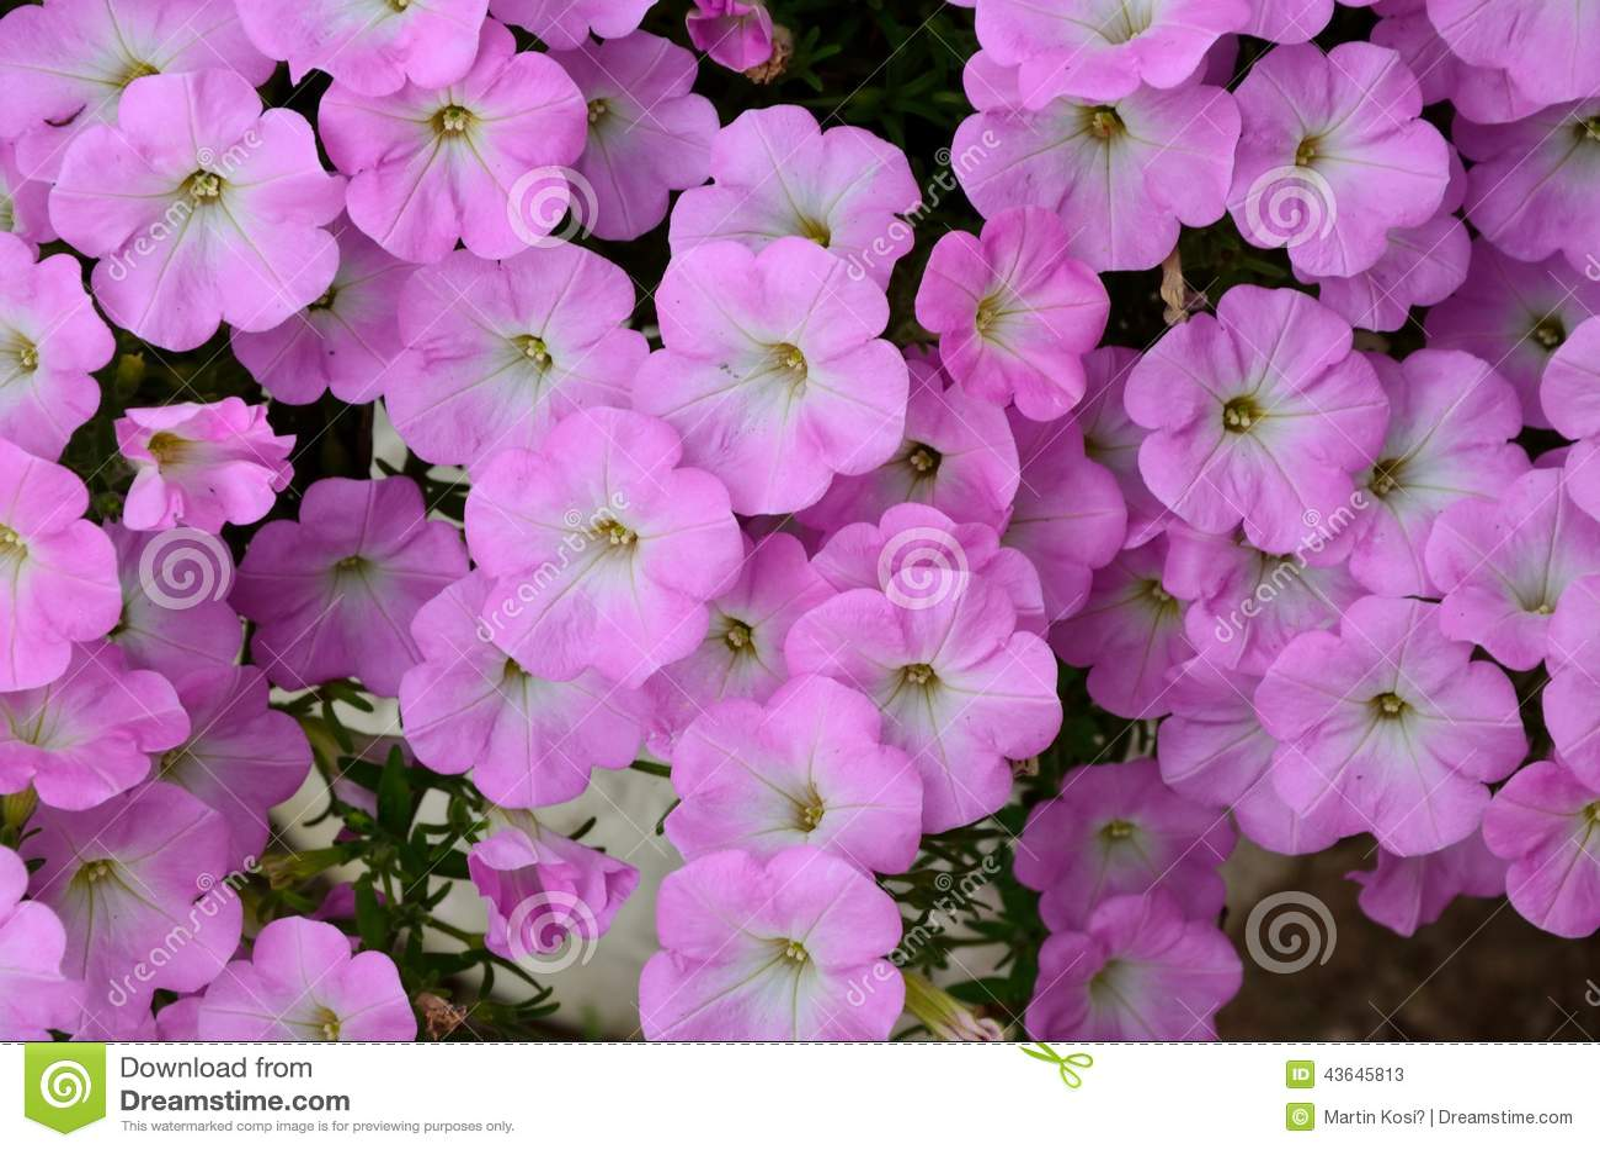 Background of pink flowers stock image image of fresh 43645813 mightylinksfo